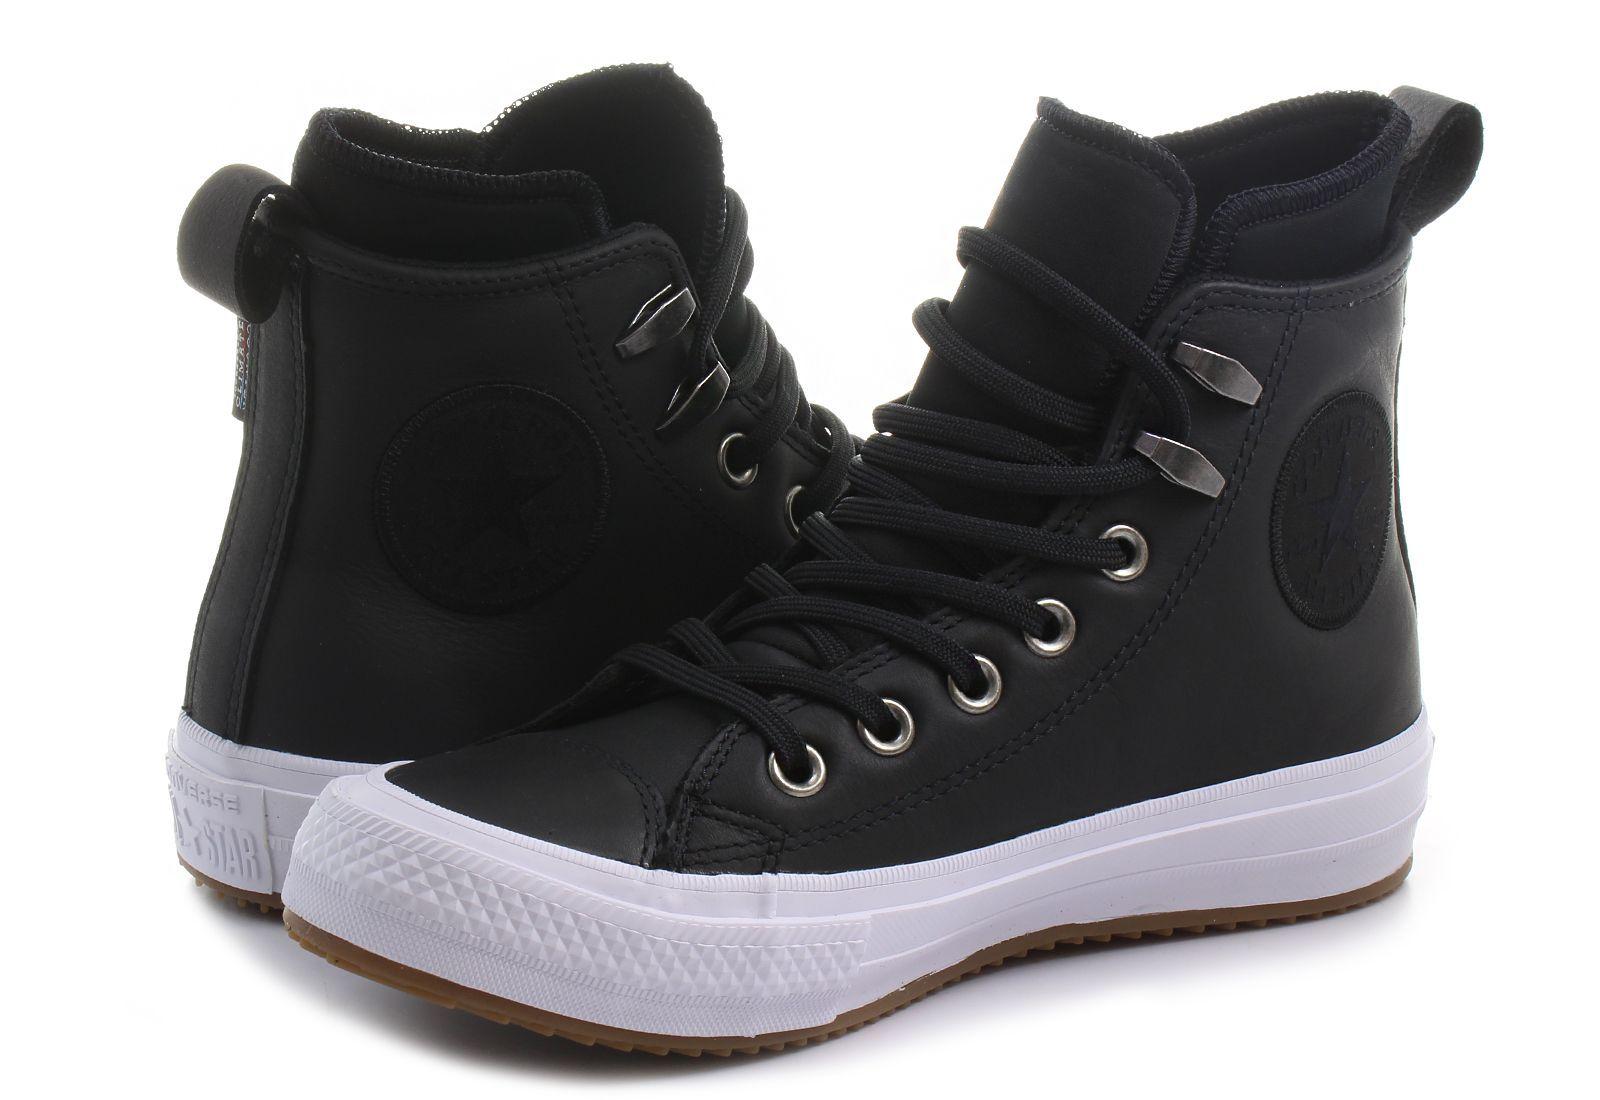 Converse Tornacipő Chuck Taylor Waterproof Boot Leather 557943c Office Shoes Magyarország